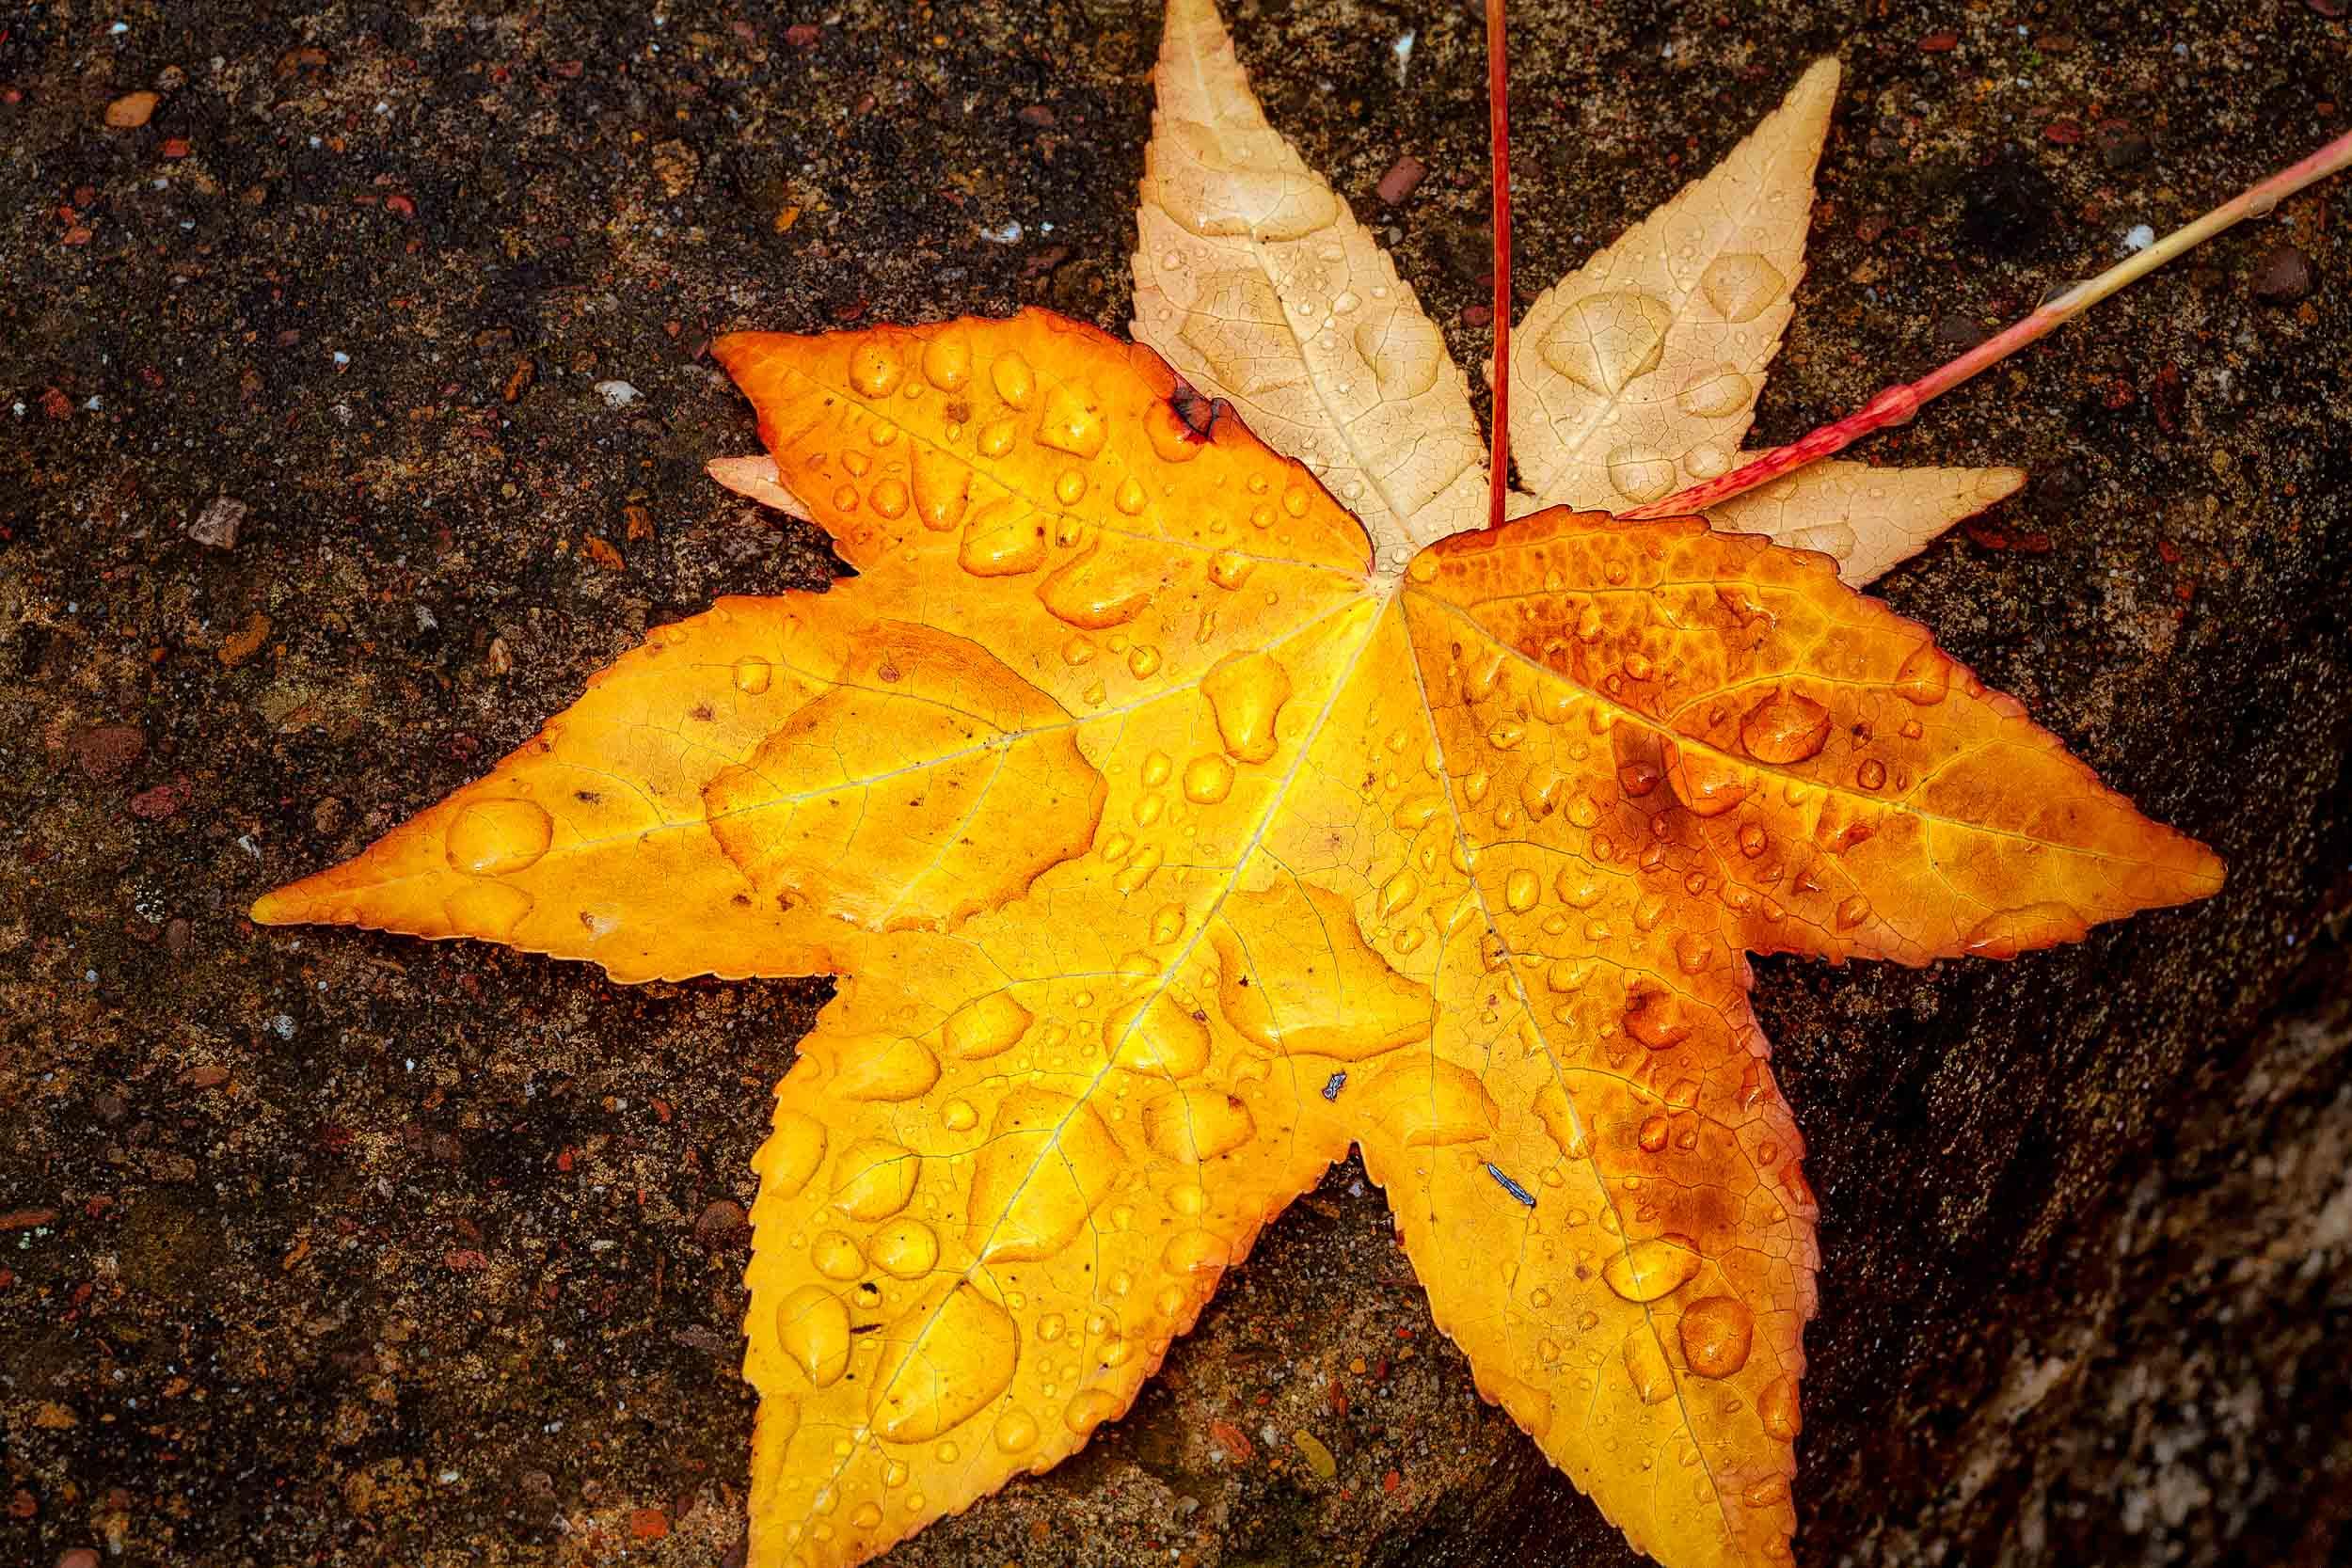 Rain drops  on a  colorful autumn leaf  makes for a dynamic desgin in  Central Victoria, Australia .